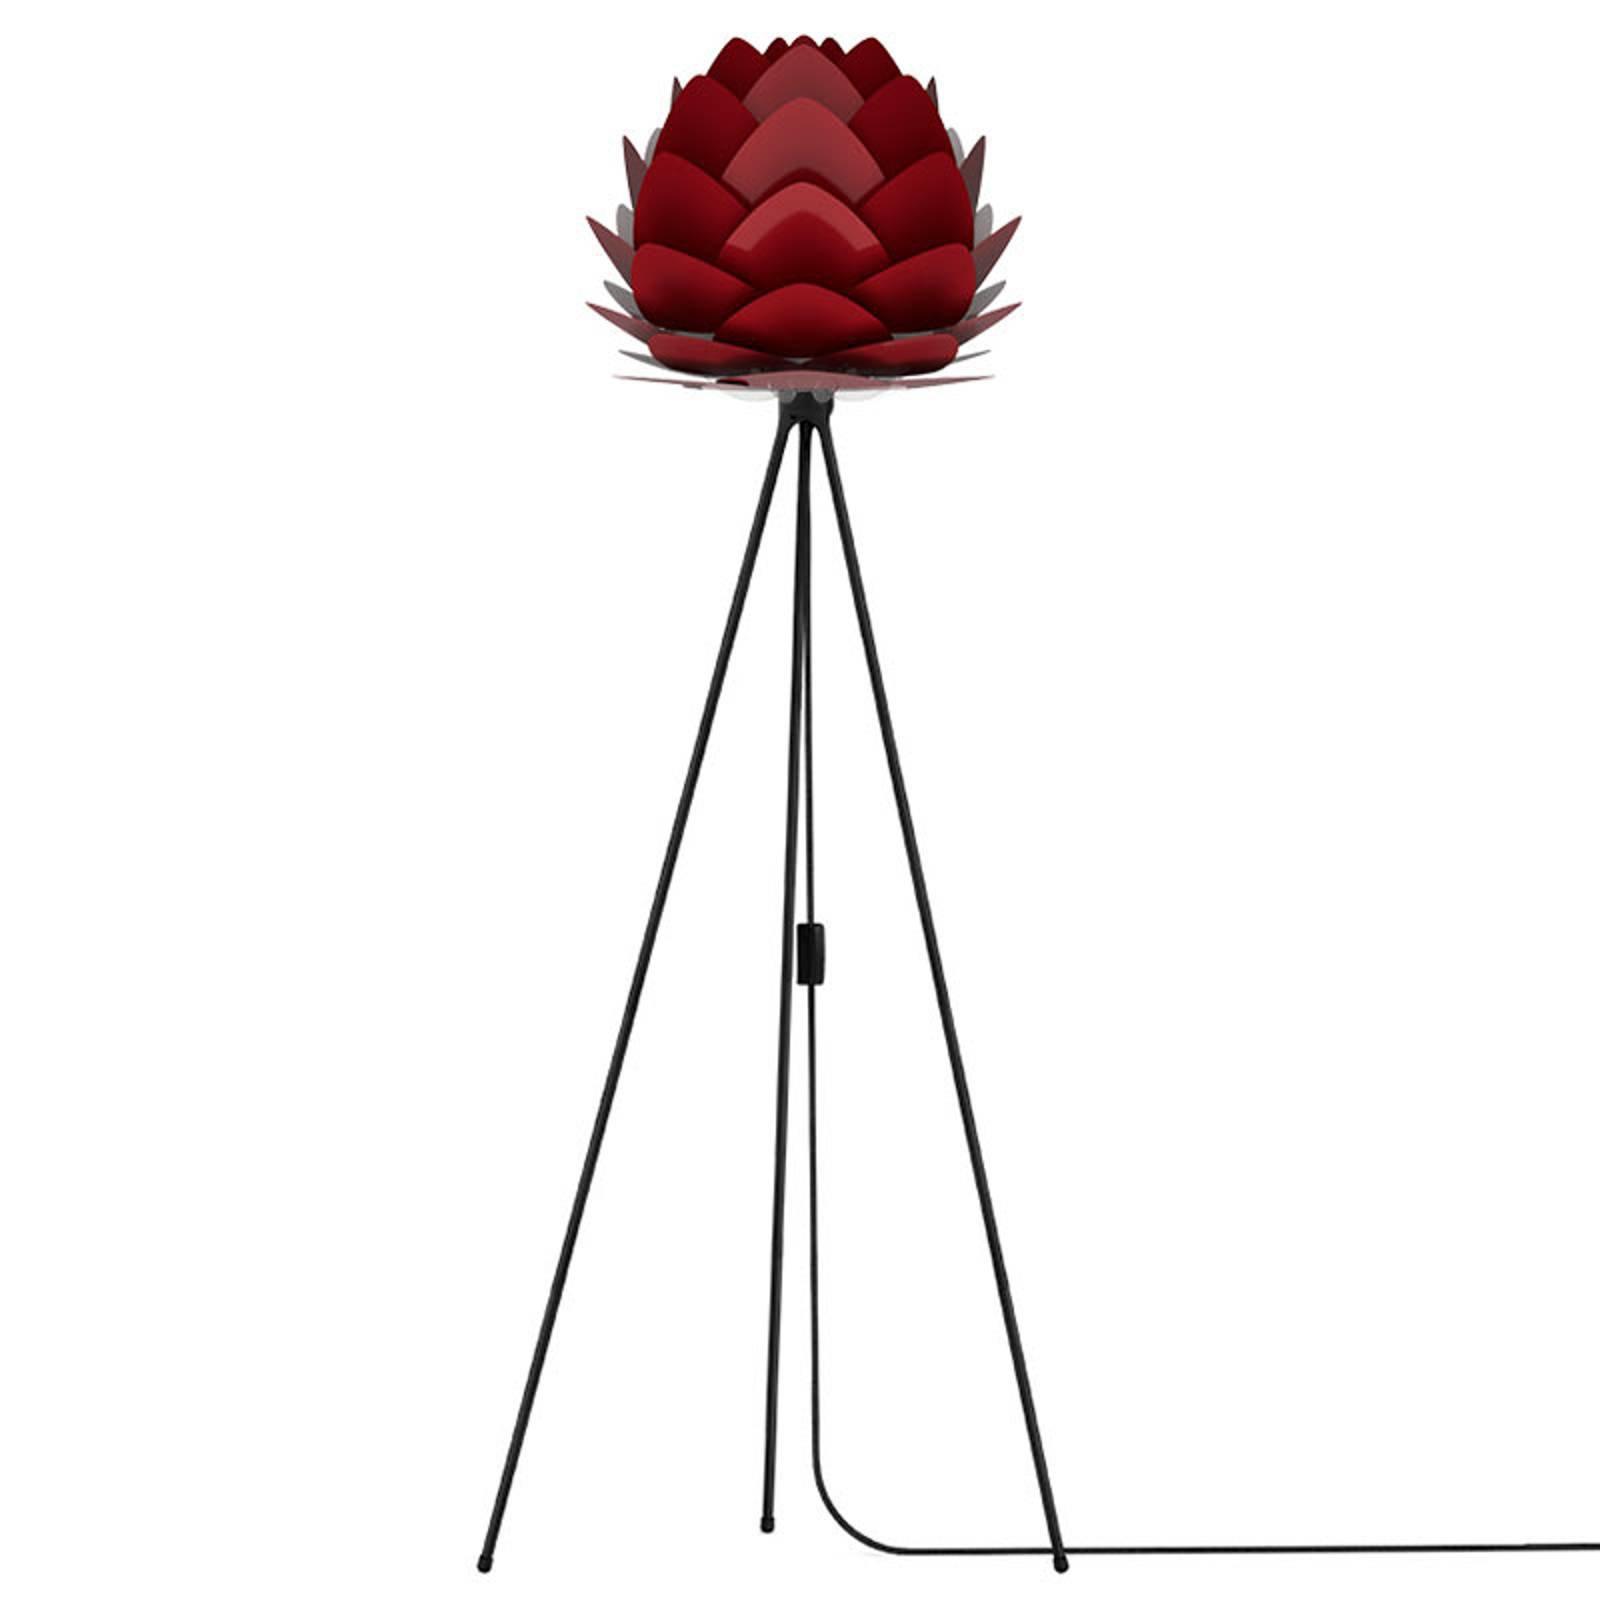 UMAGE Aluvia mini-gulvlampe svart/rubinrød